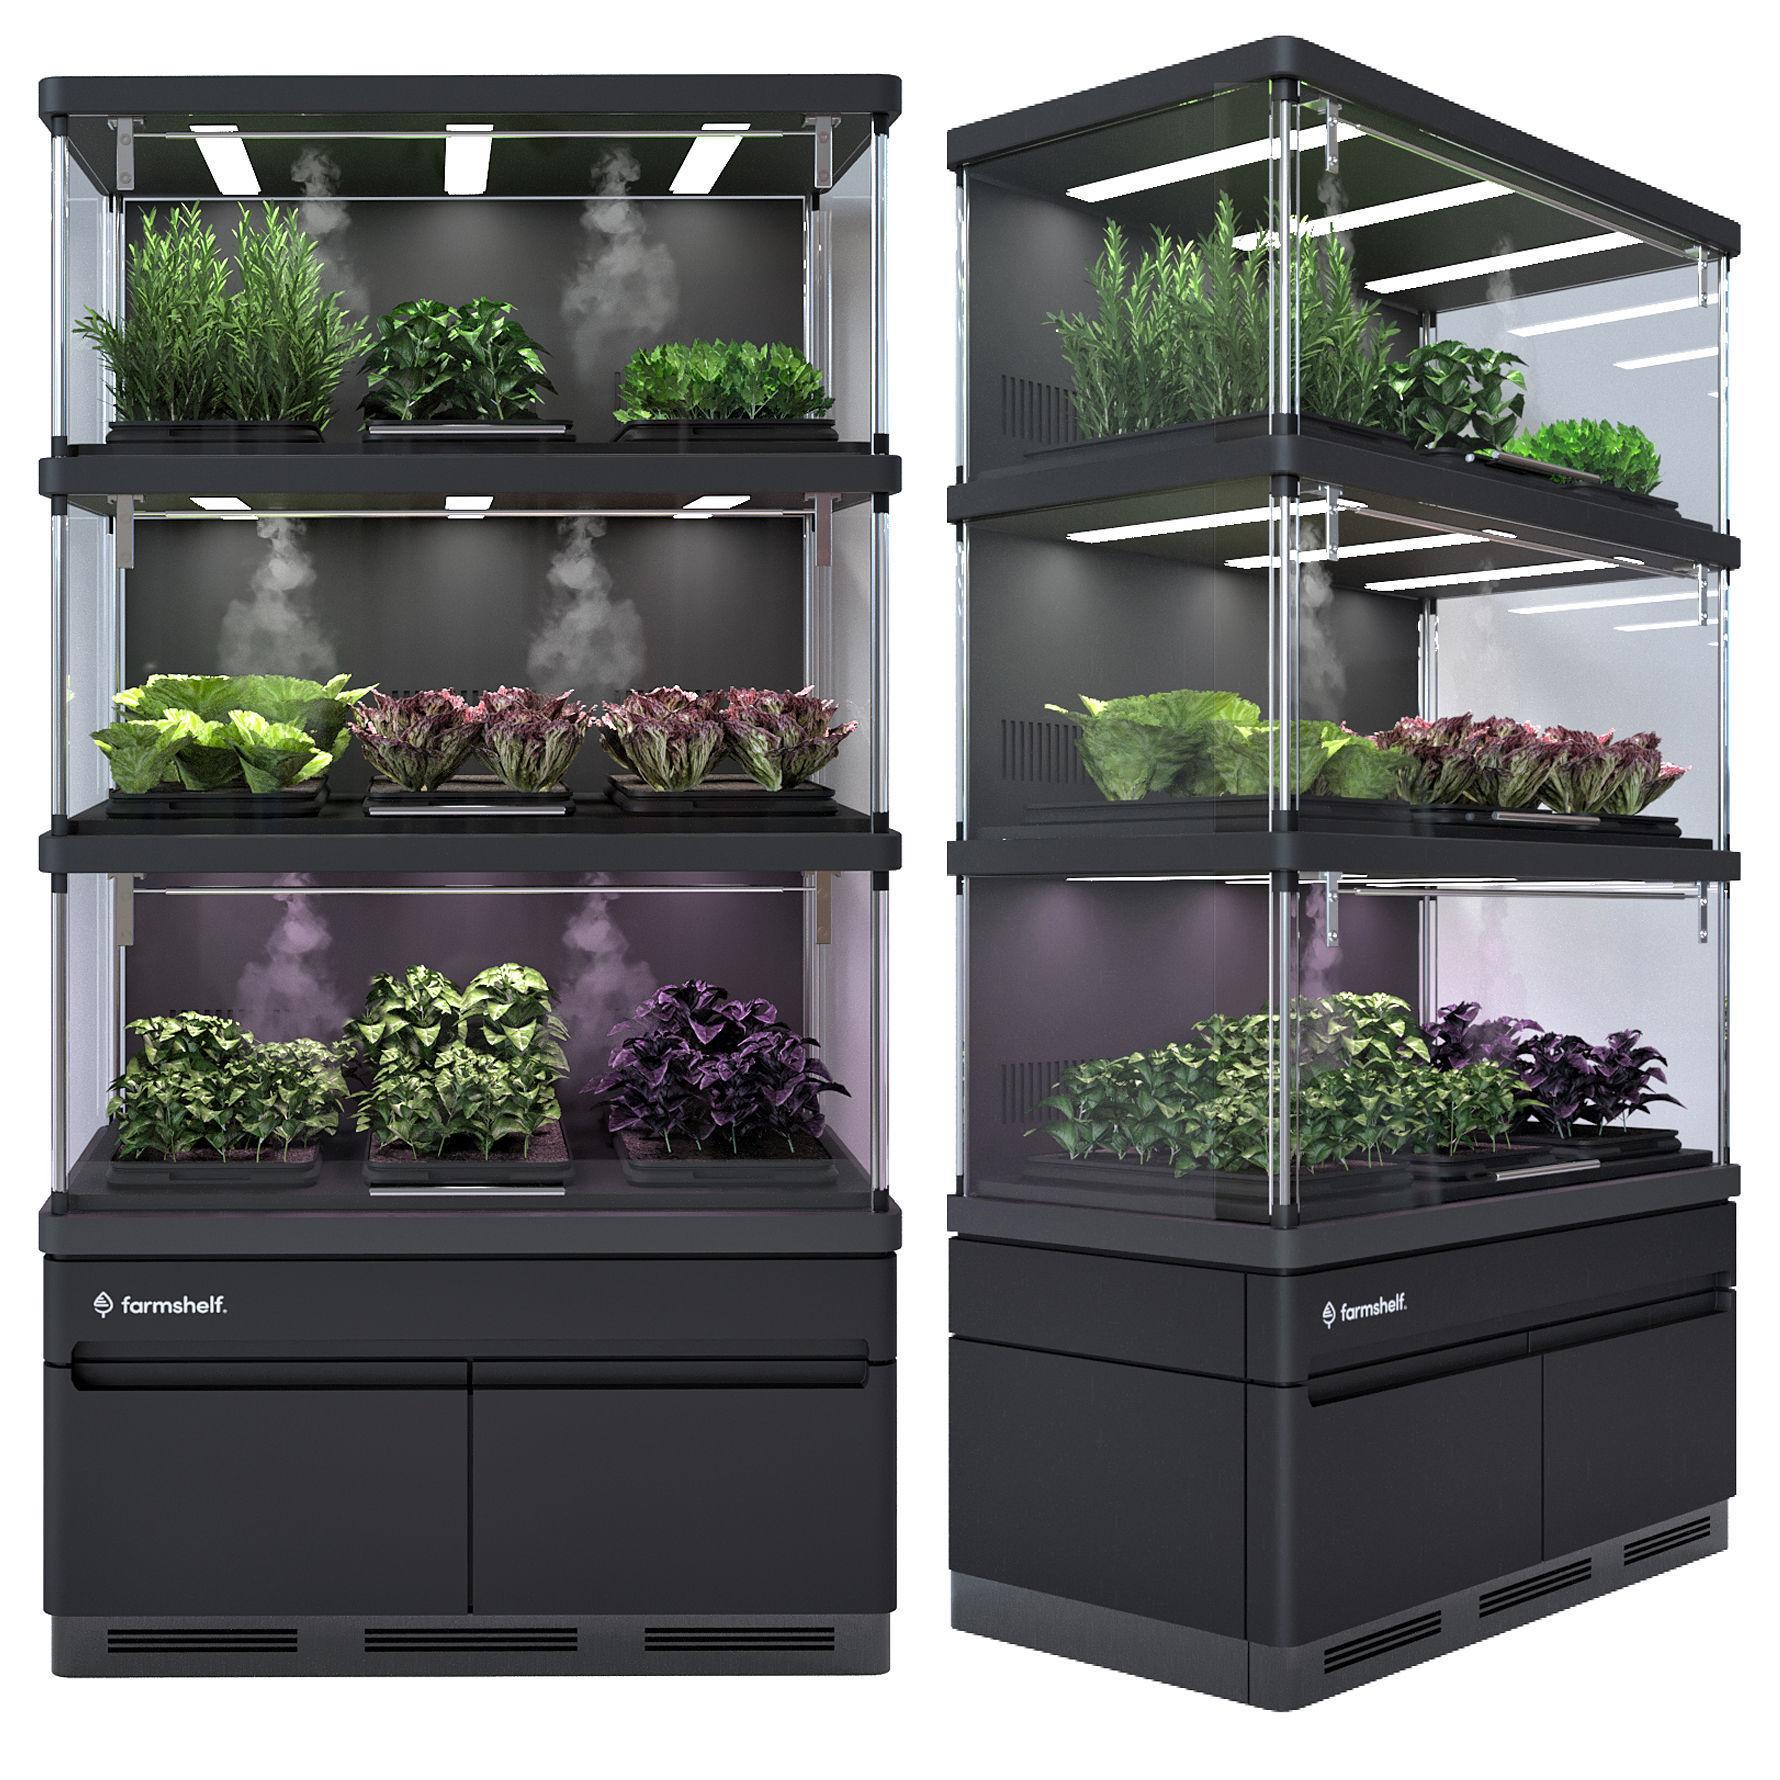 Farmshelf fridge